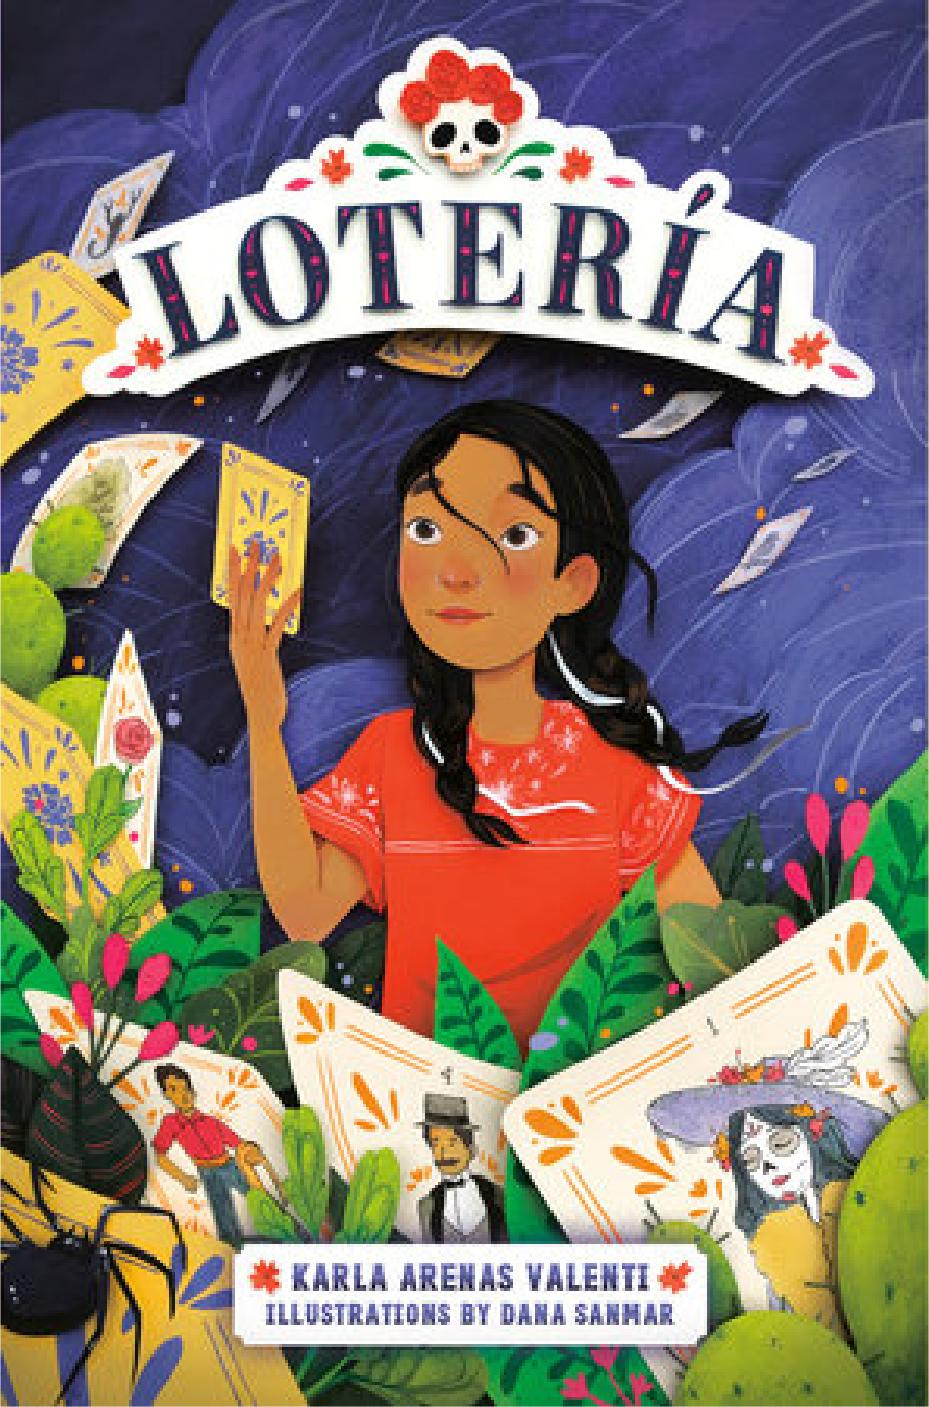 Lotería by Karla Arenas Valenti, illus. by Dana Sanmar